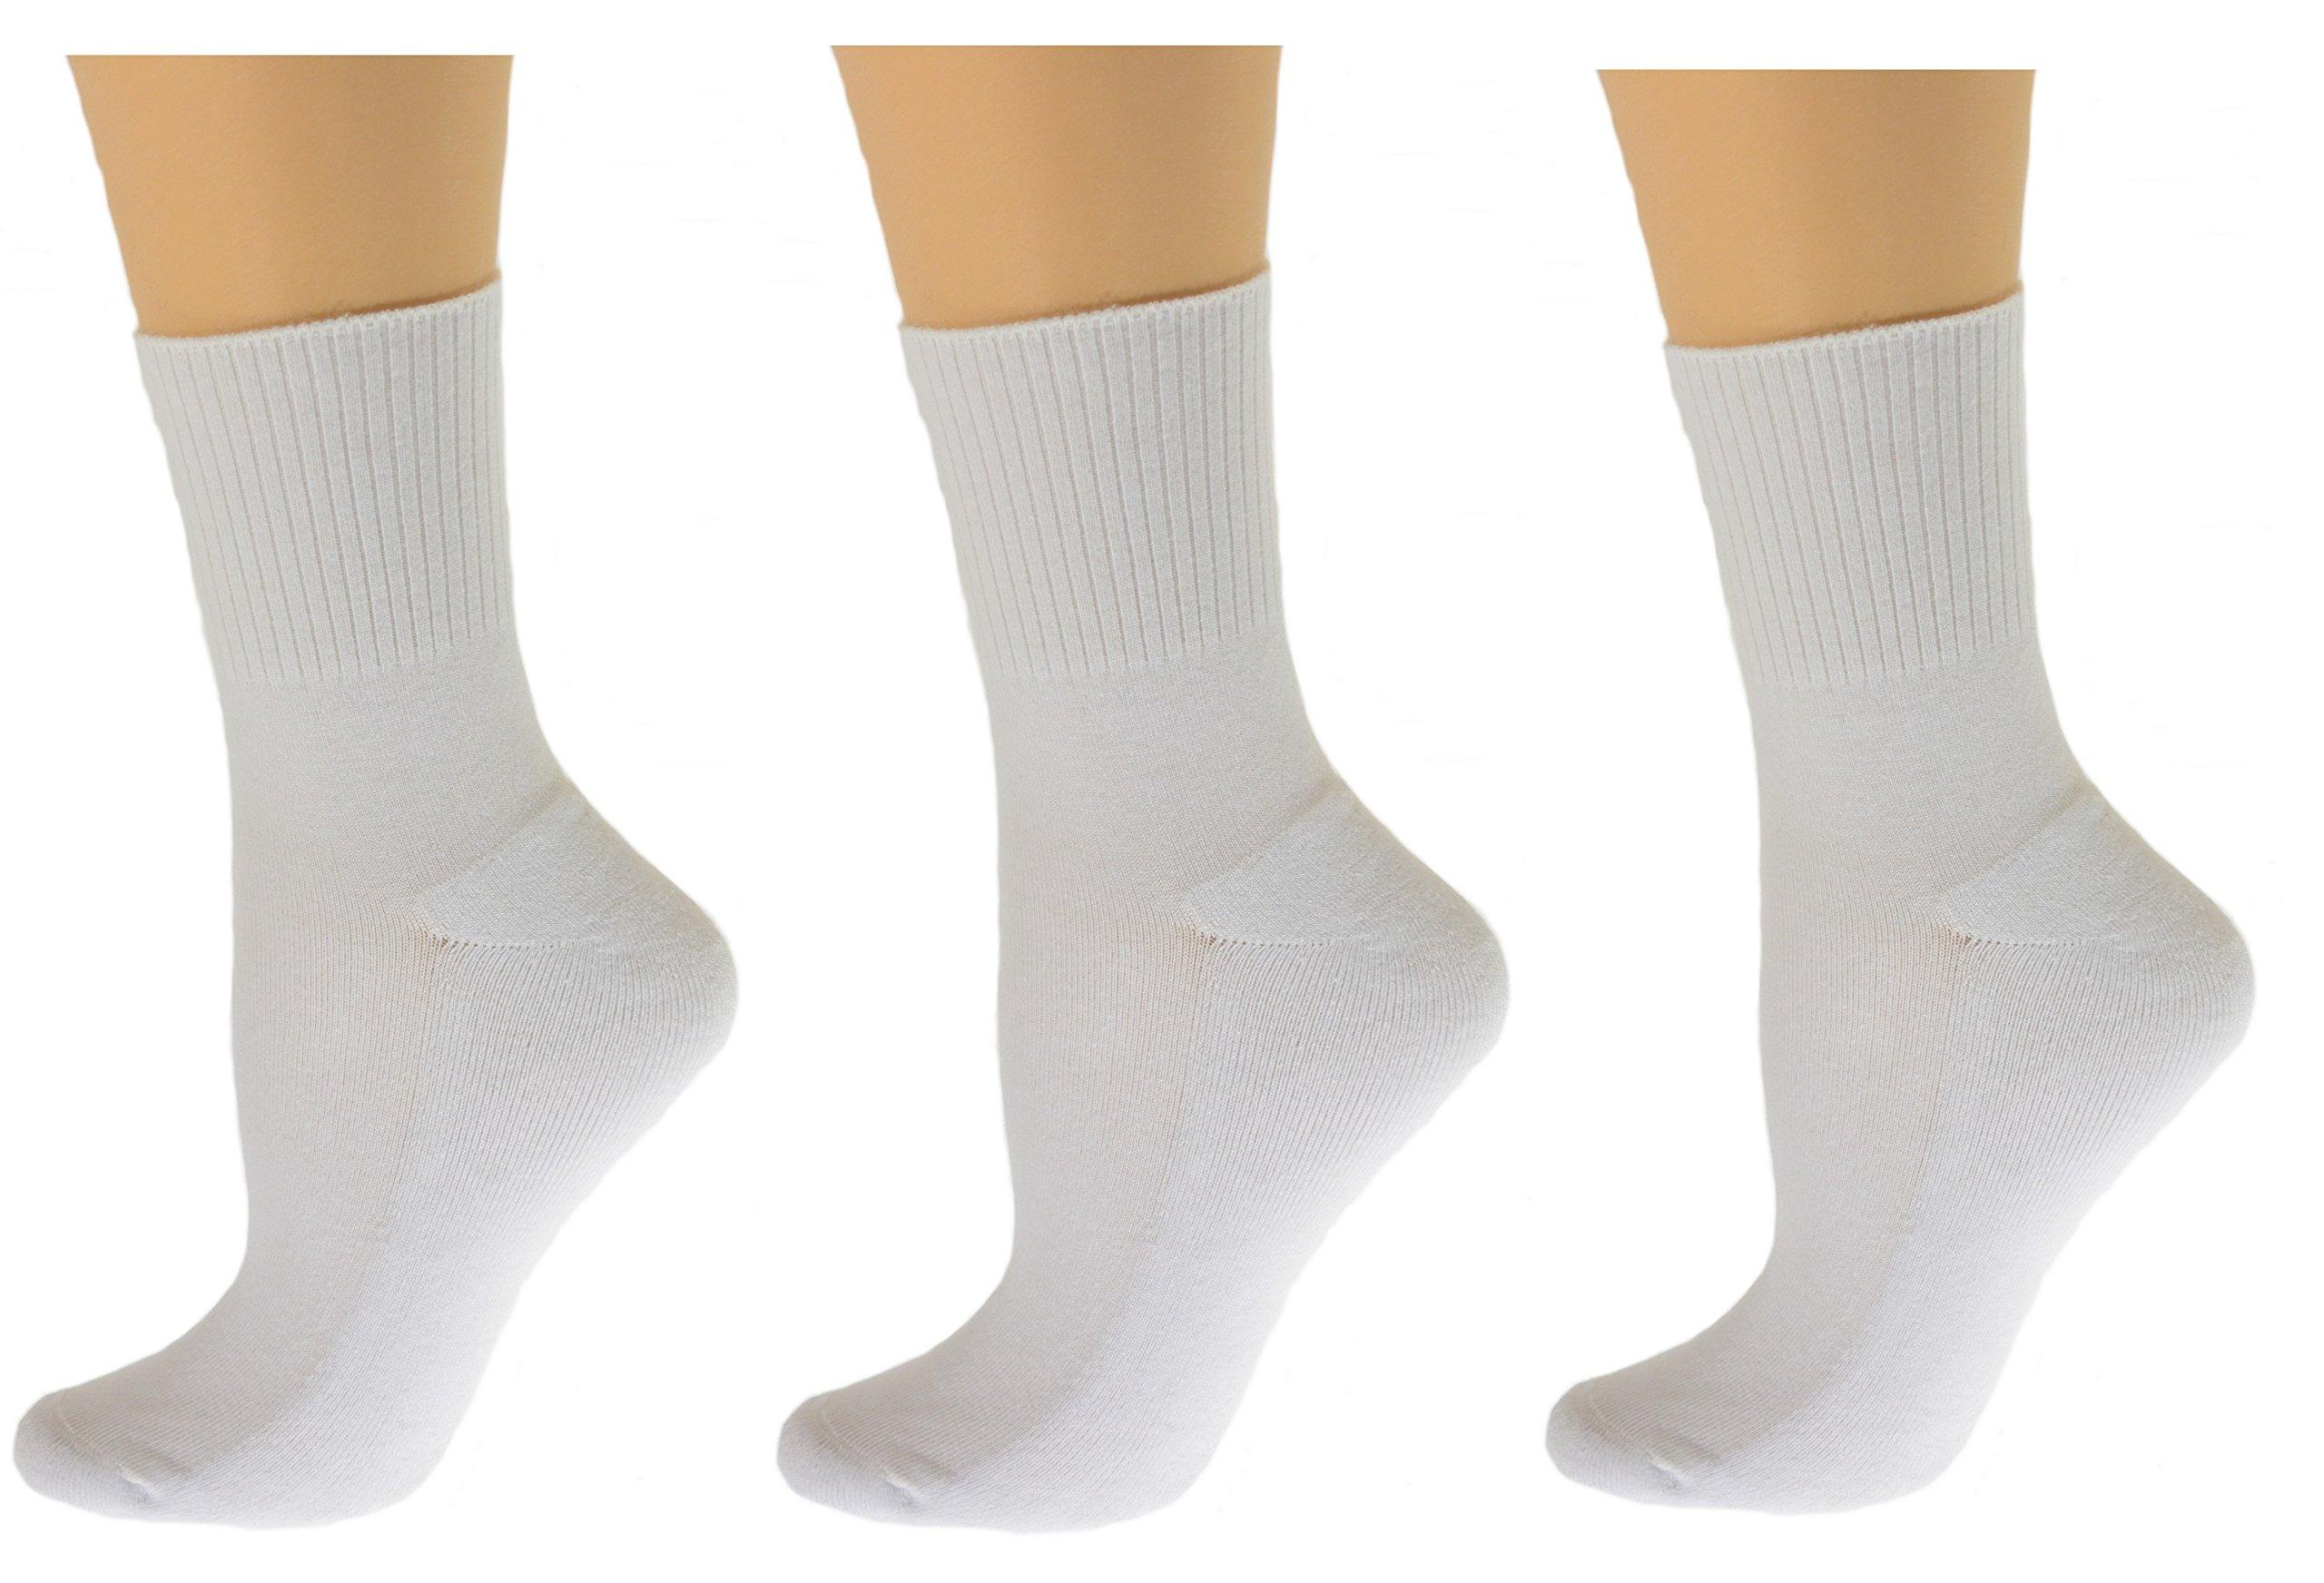 Sierra Socks Diabetic Arthritic Womens Ankle Cushioned Sole Smooth Toe 3 Pair Pack (9-11, White)